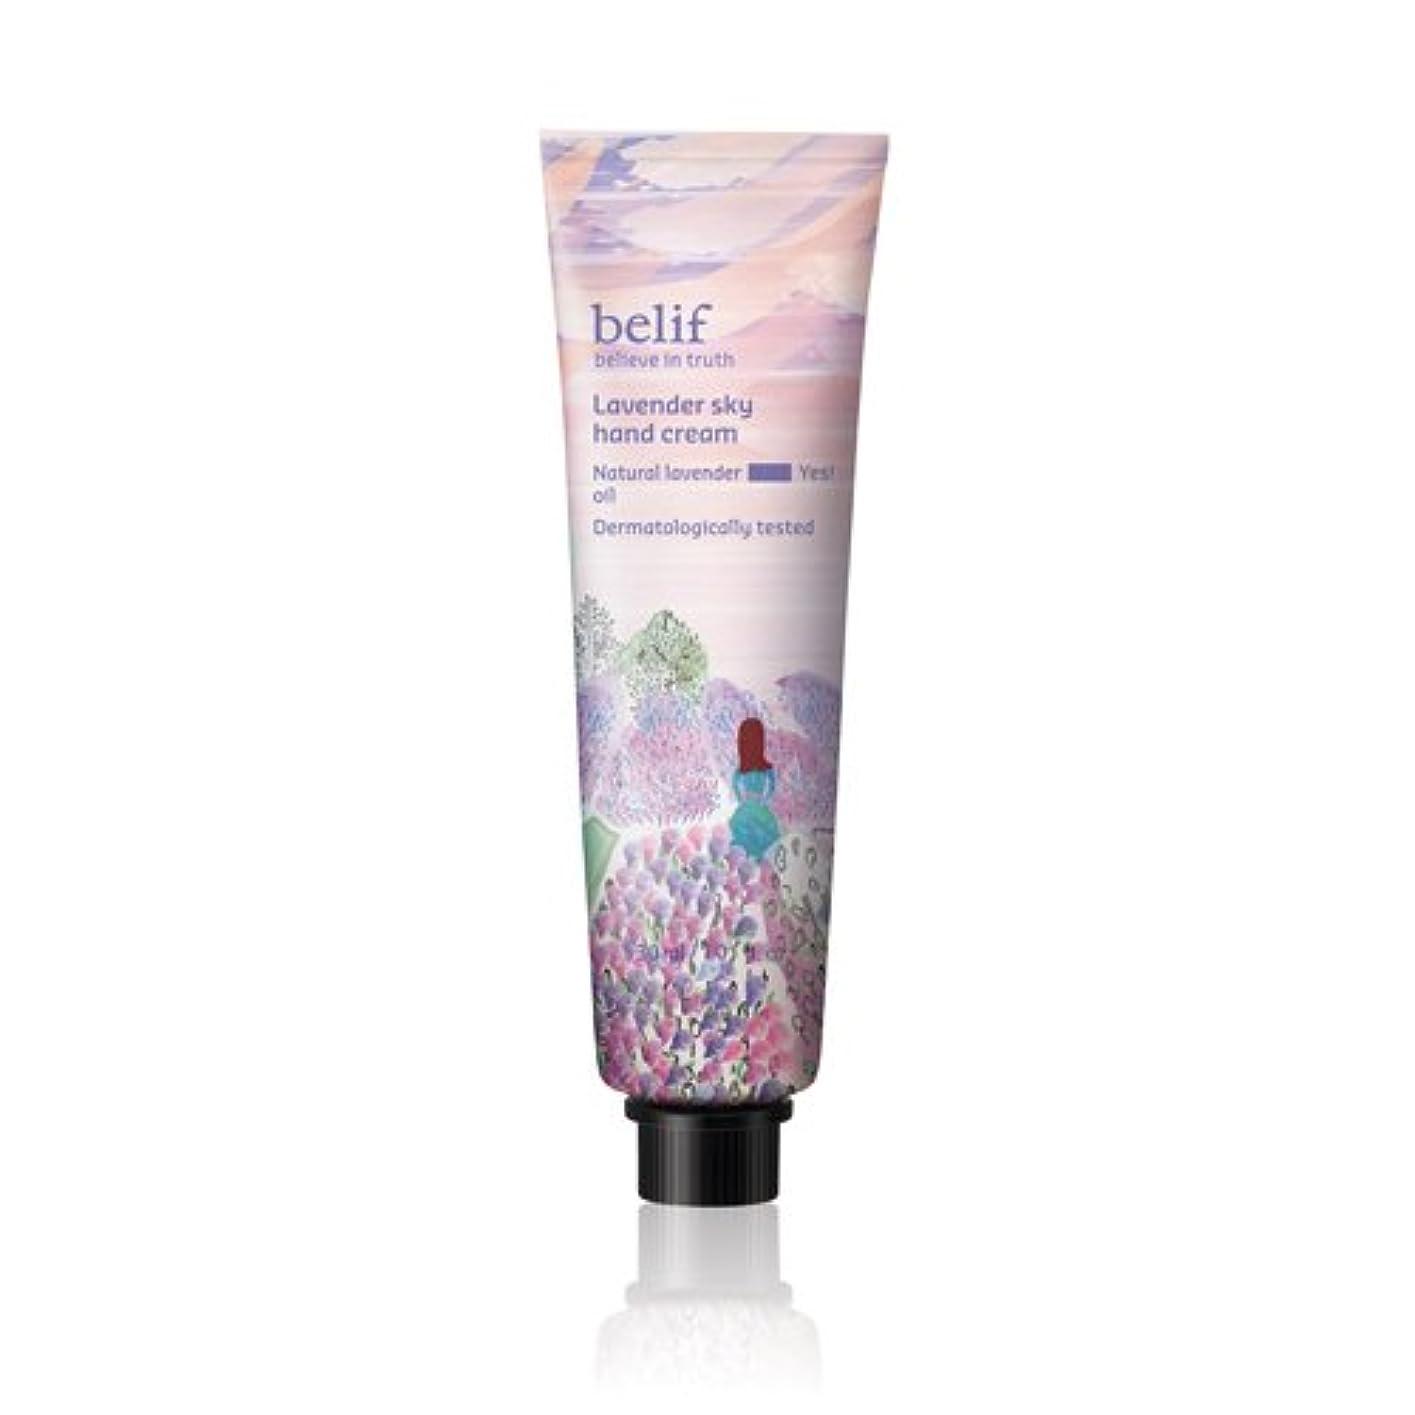 Belif(ビリーフ)Lavender sky hand cream 30ml/ラベンダースカイハンドクリーム